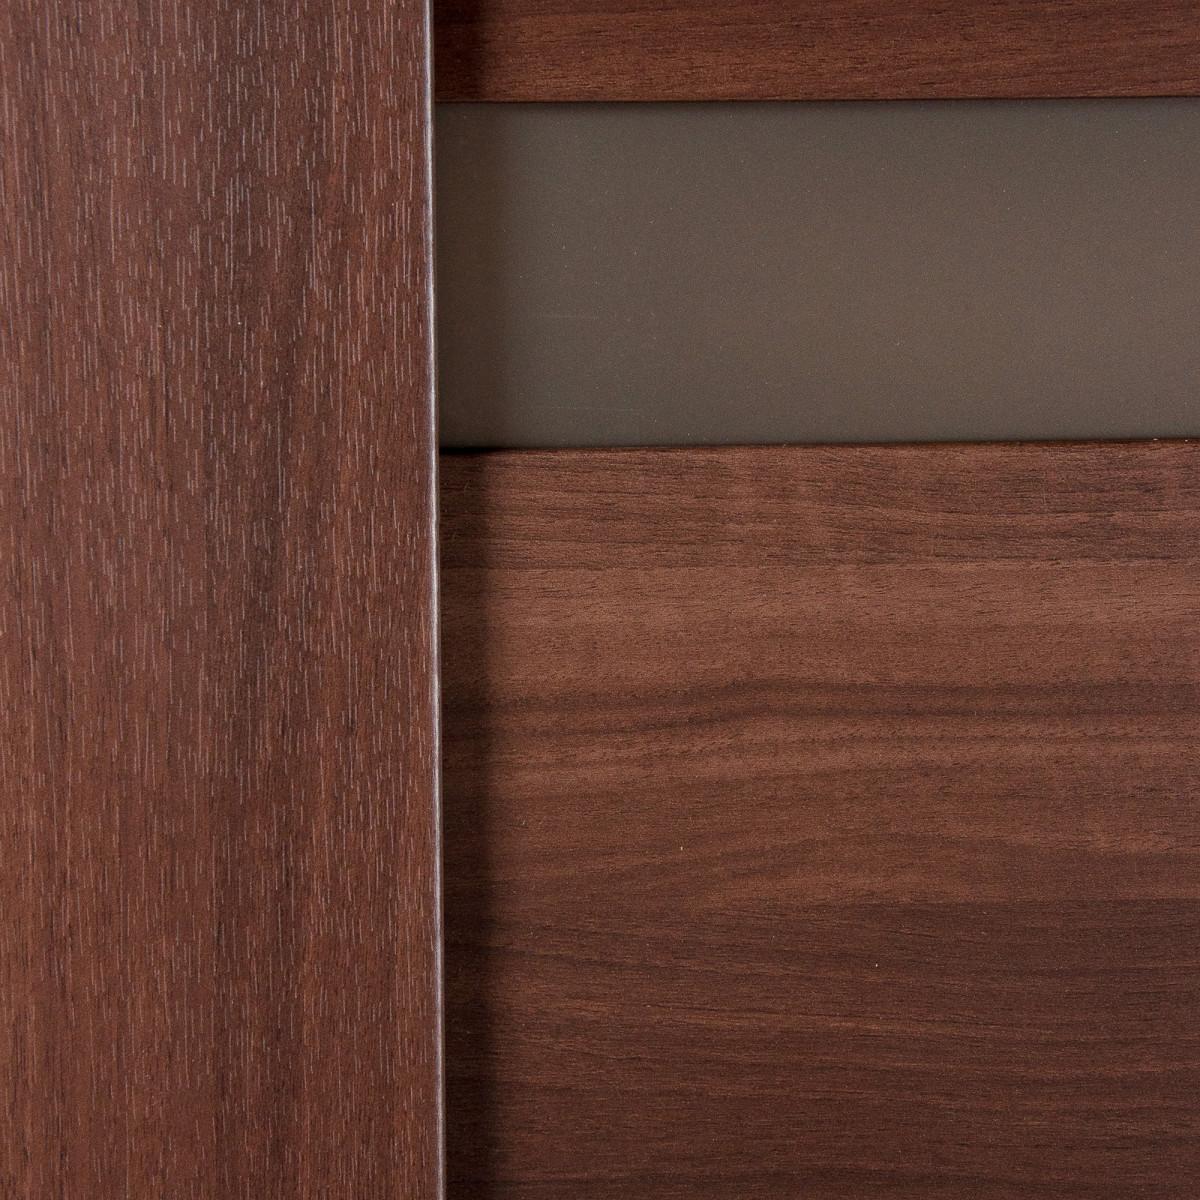 Дверь Межкомнатная Глухая Artens Велдон 60x200 Цвет Мокко/Бронза Без Фурнитуры